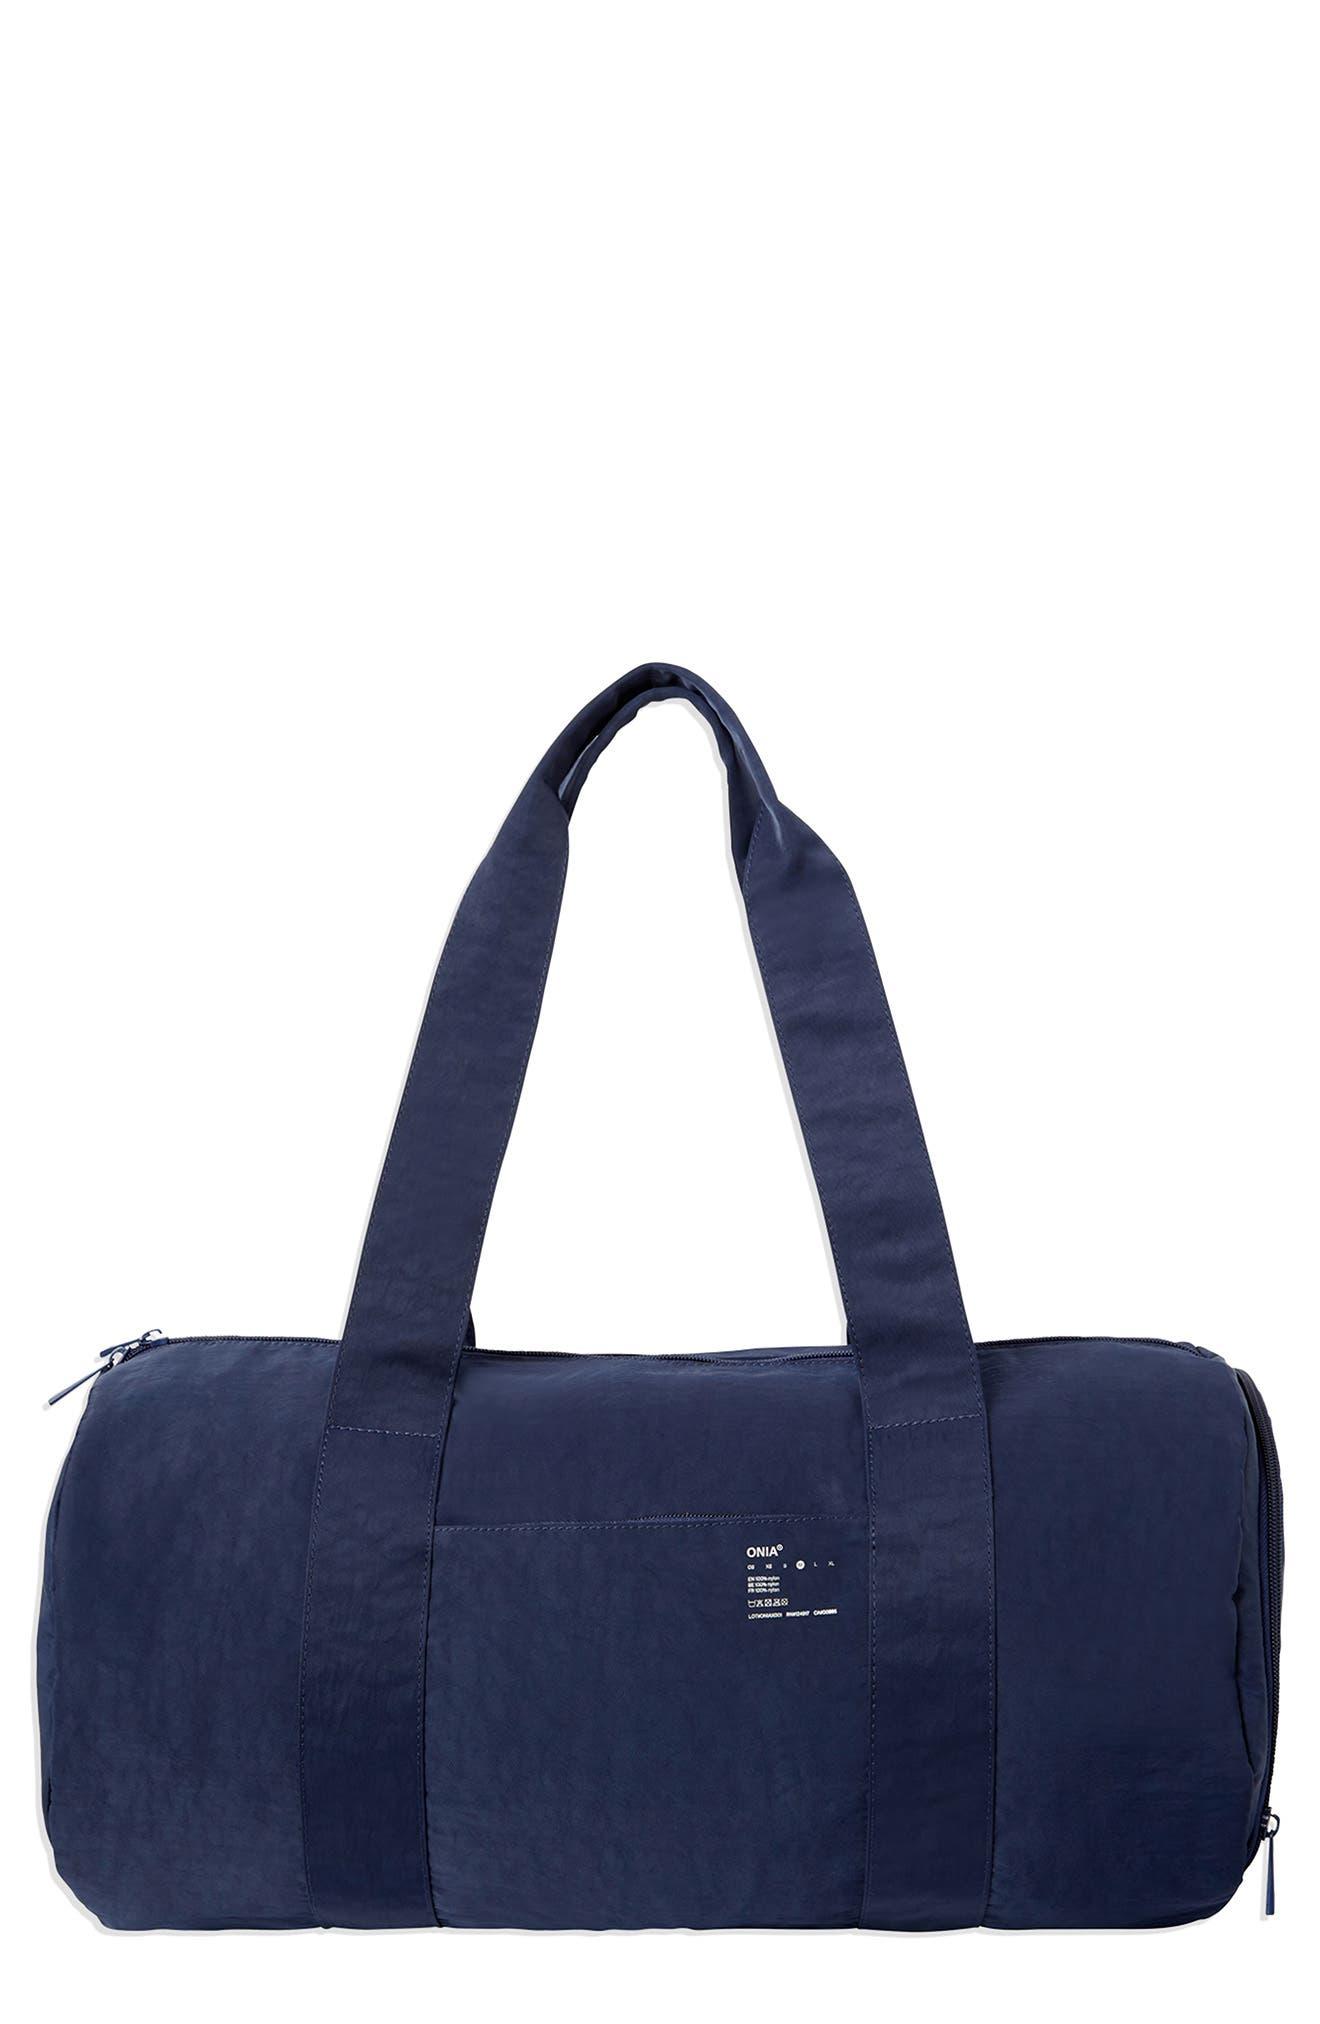 Crinkle Duffle Bag